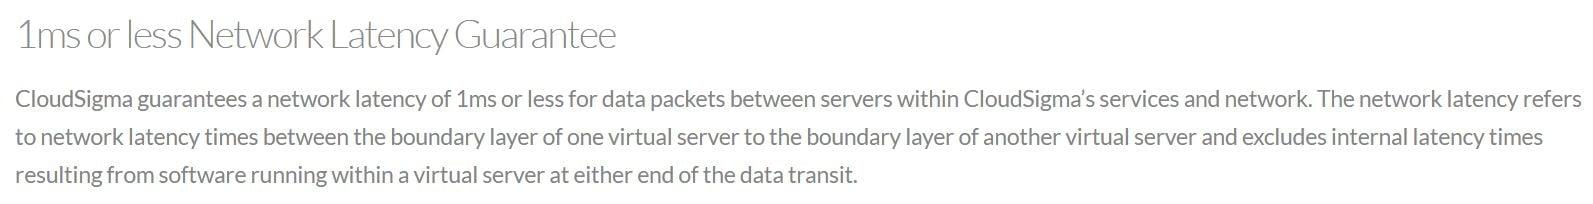 cloudsigma-performance-latency guarantee